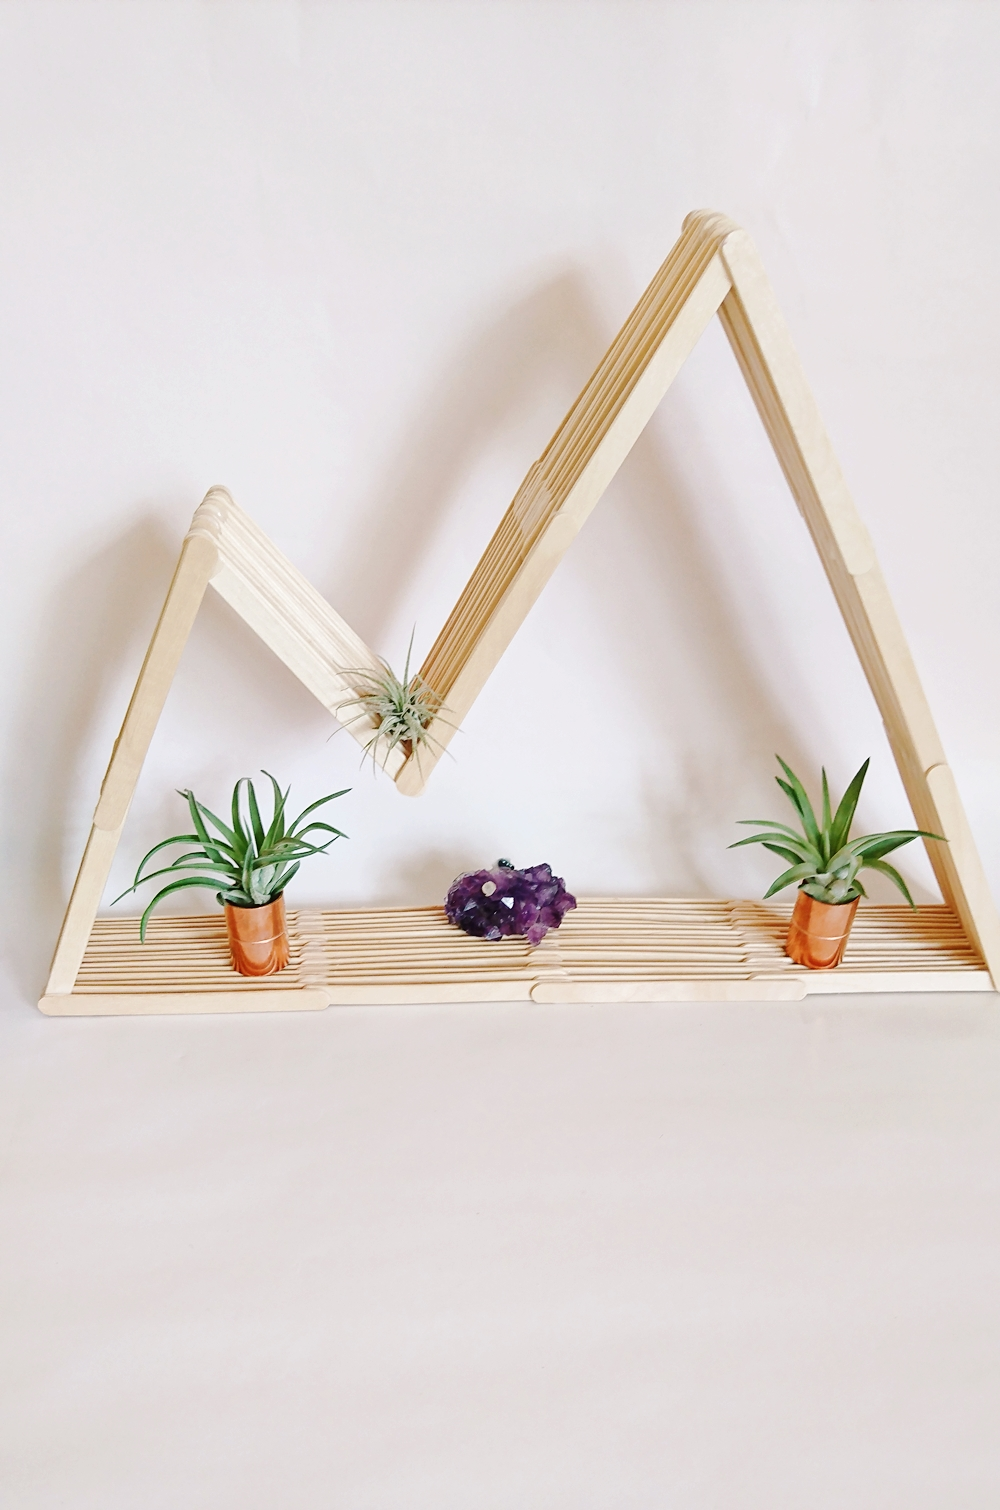 DIY Bergregal aus Holzstäbchen. Regal aus Eisstecker. Mountain shelf popsicle sticks, regal selber bauem berg (15)